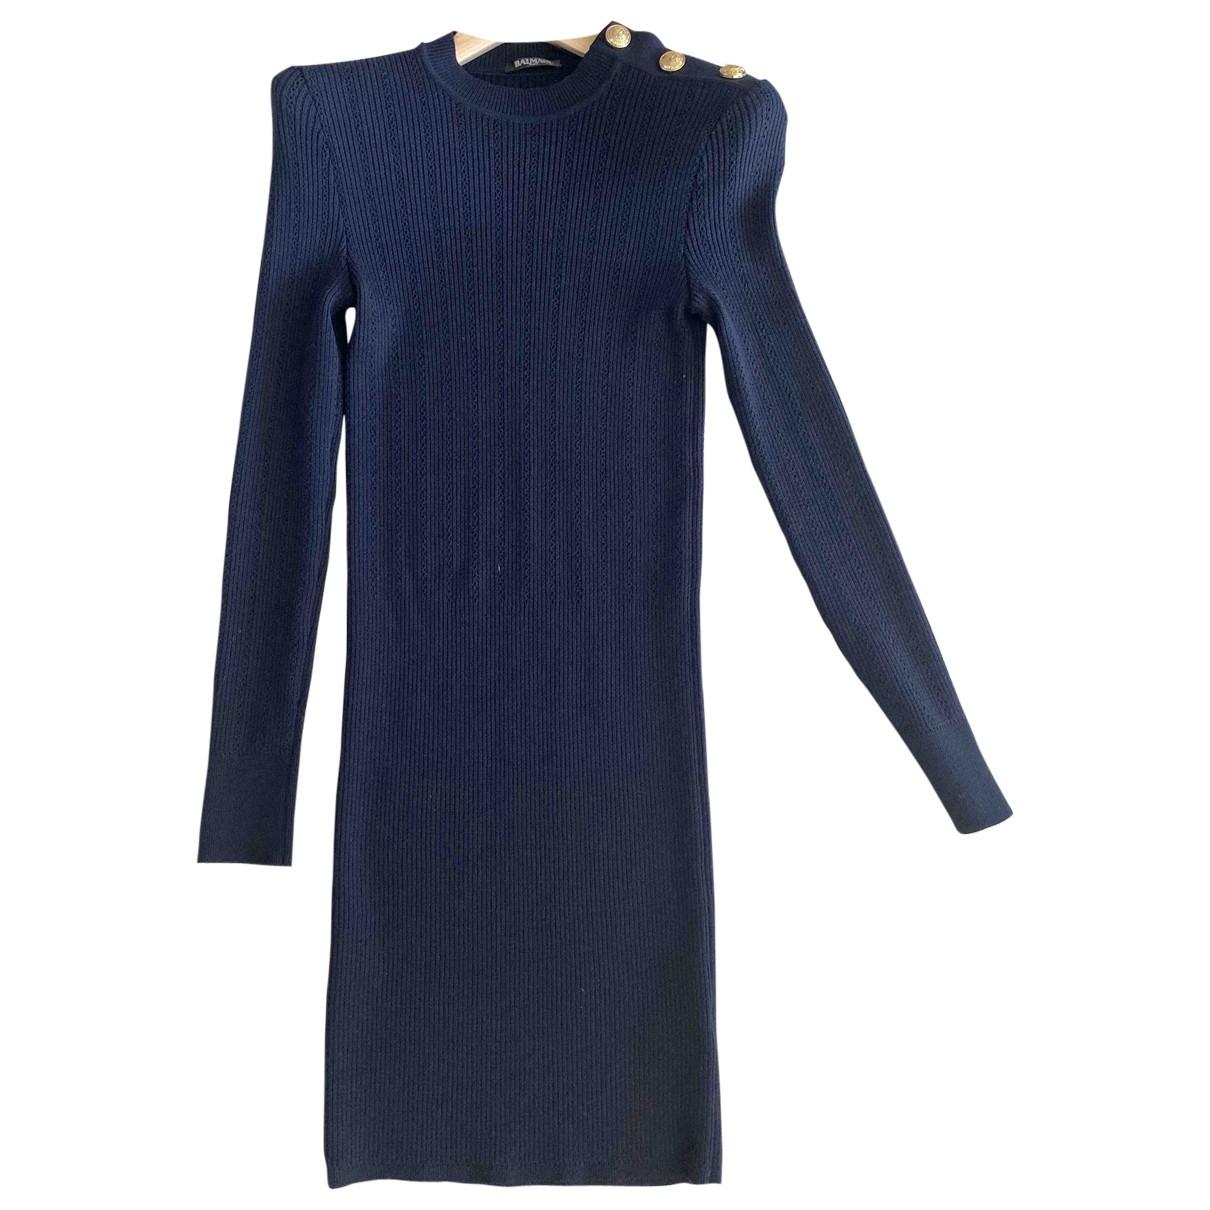 Balmain \N Blue Wool dress for Women 40 FR